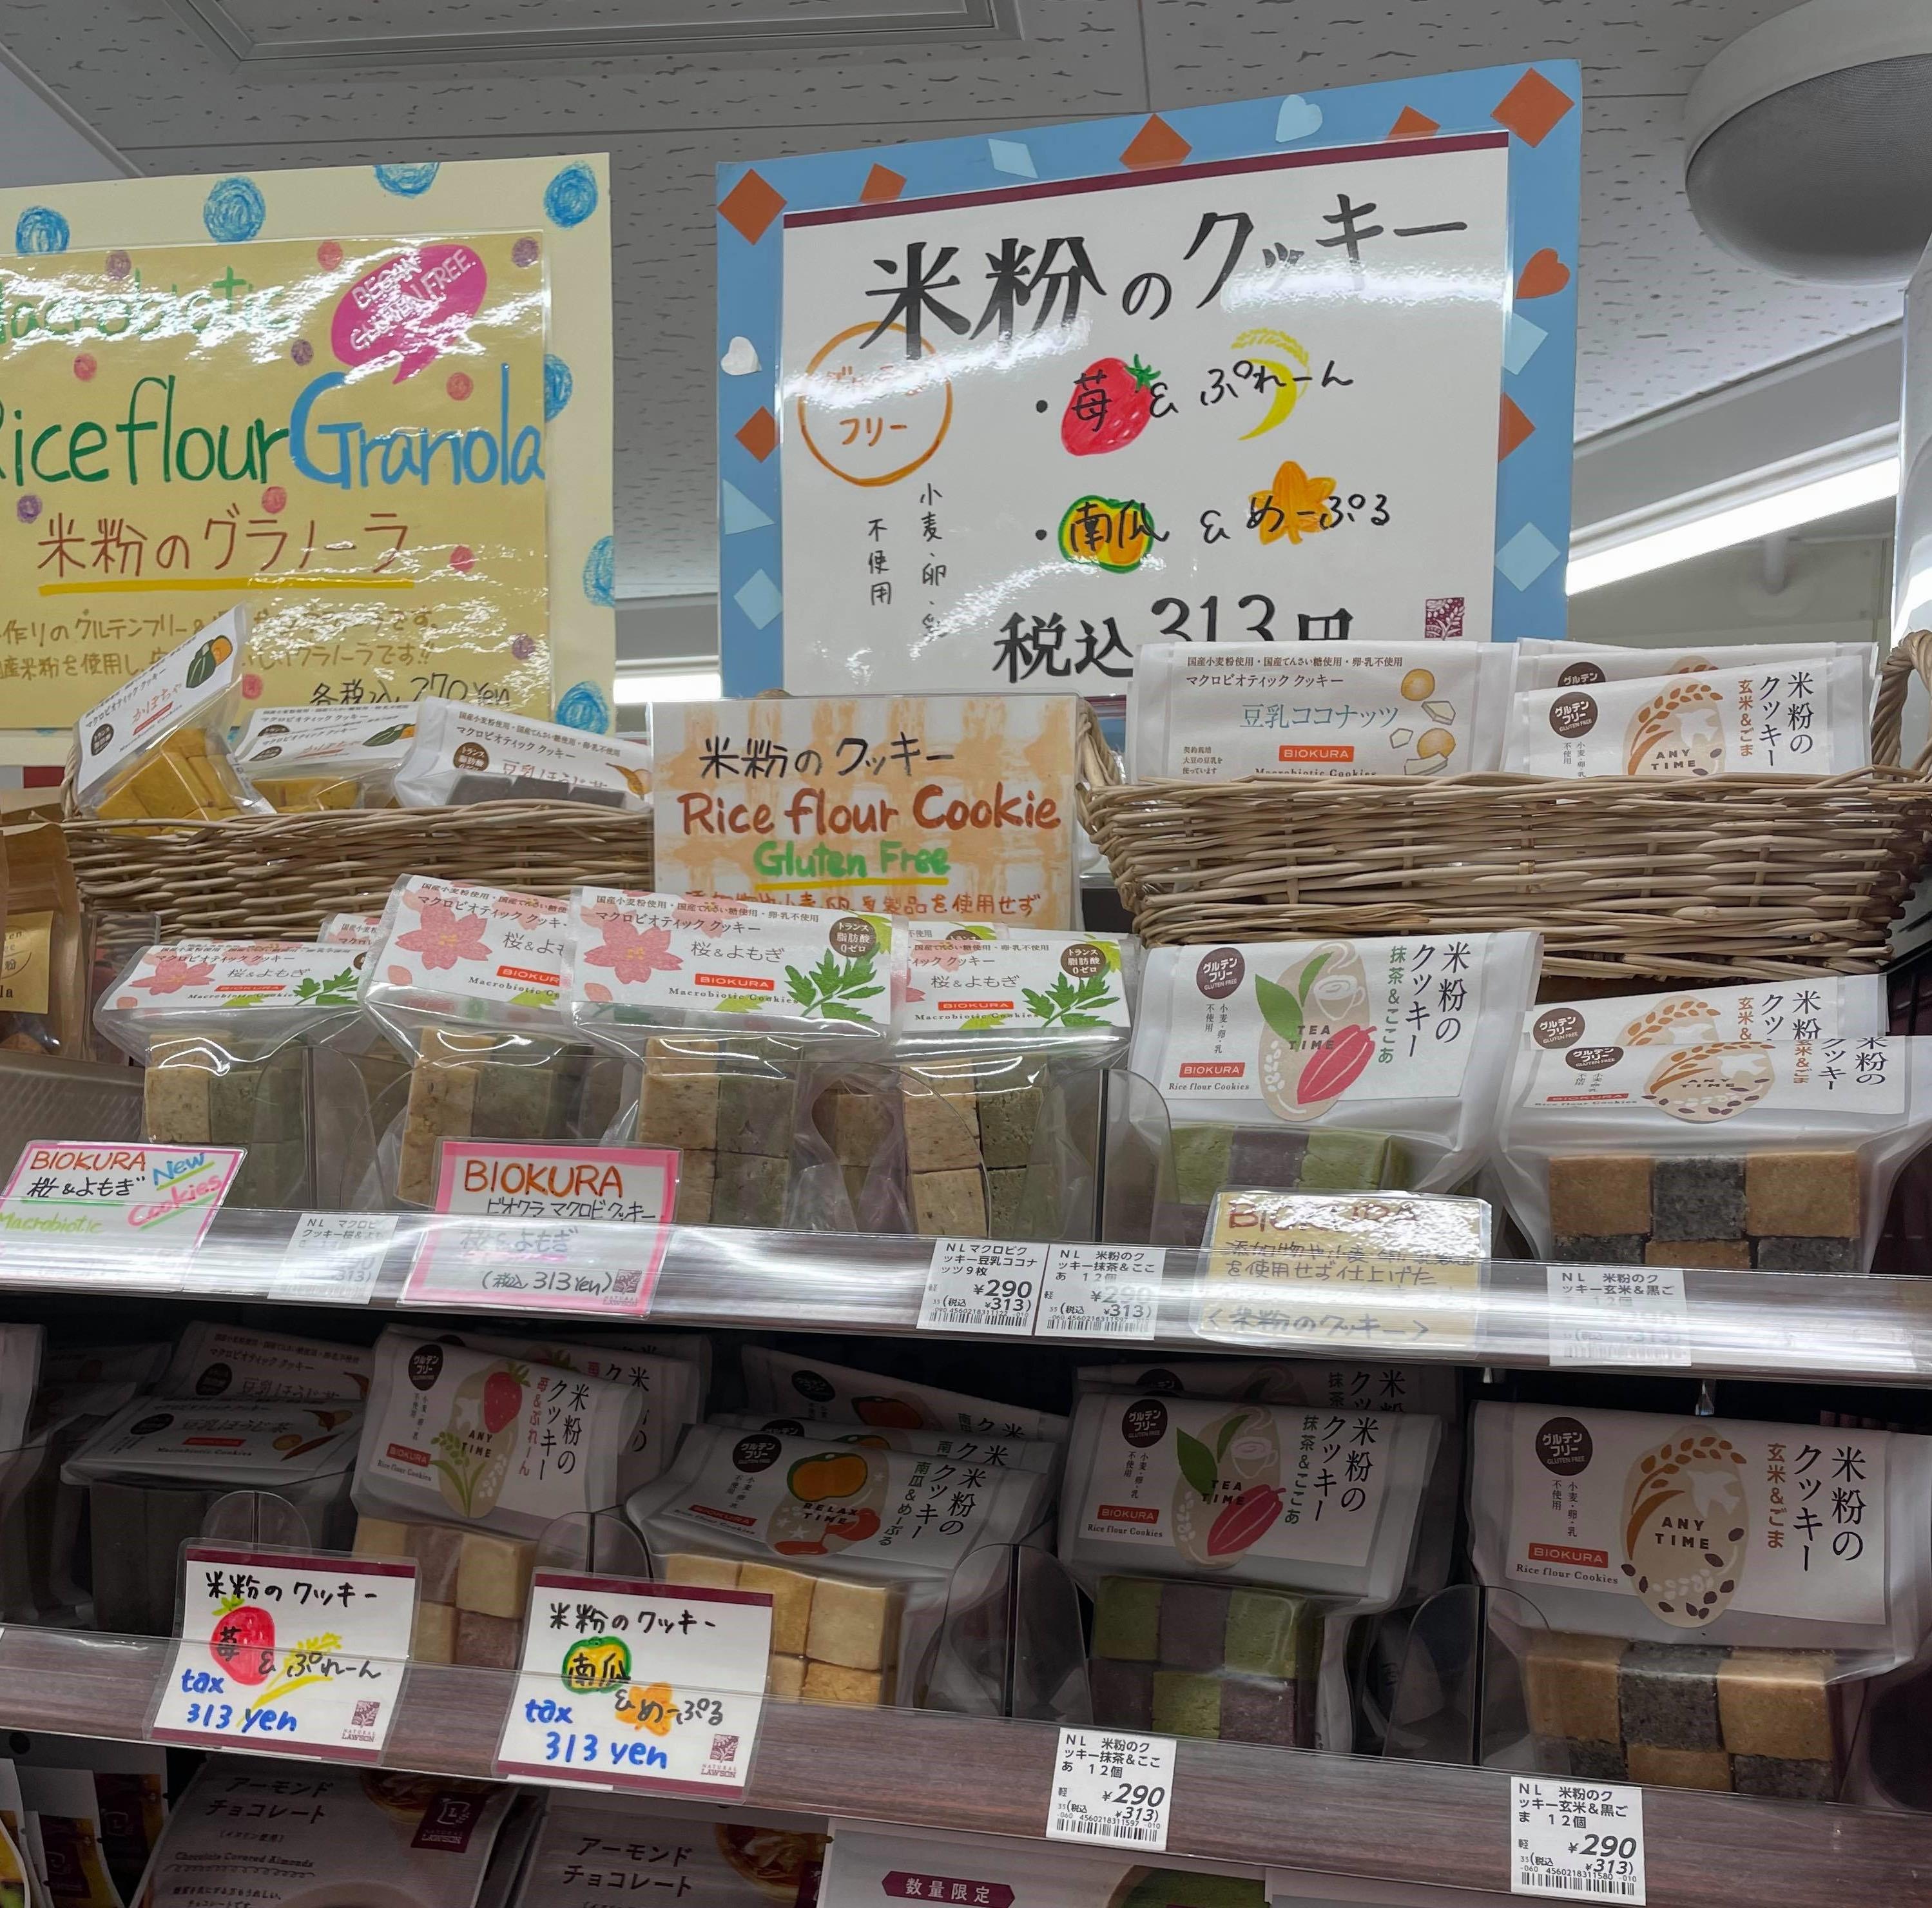 Biokura macrobiotic cookies